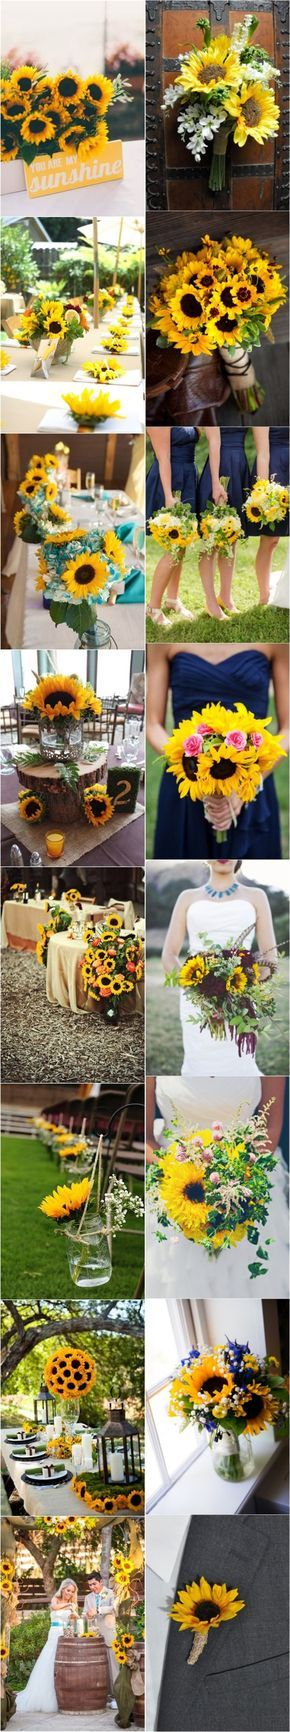 sunflower wedding invitations printable%0A     Sunflower Wedding Ideas and Wedding Invitations